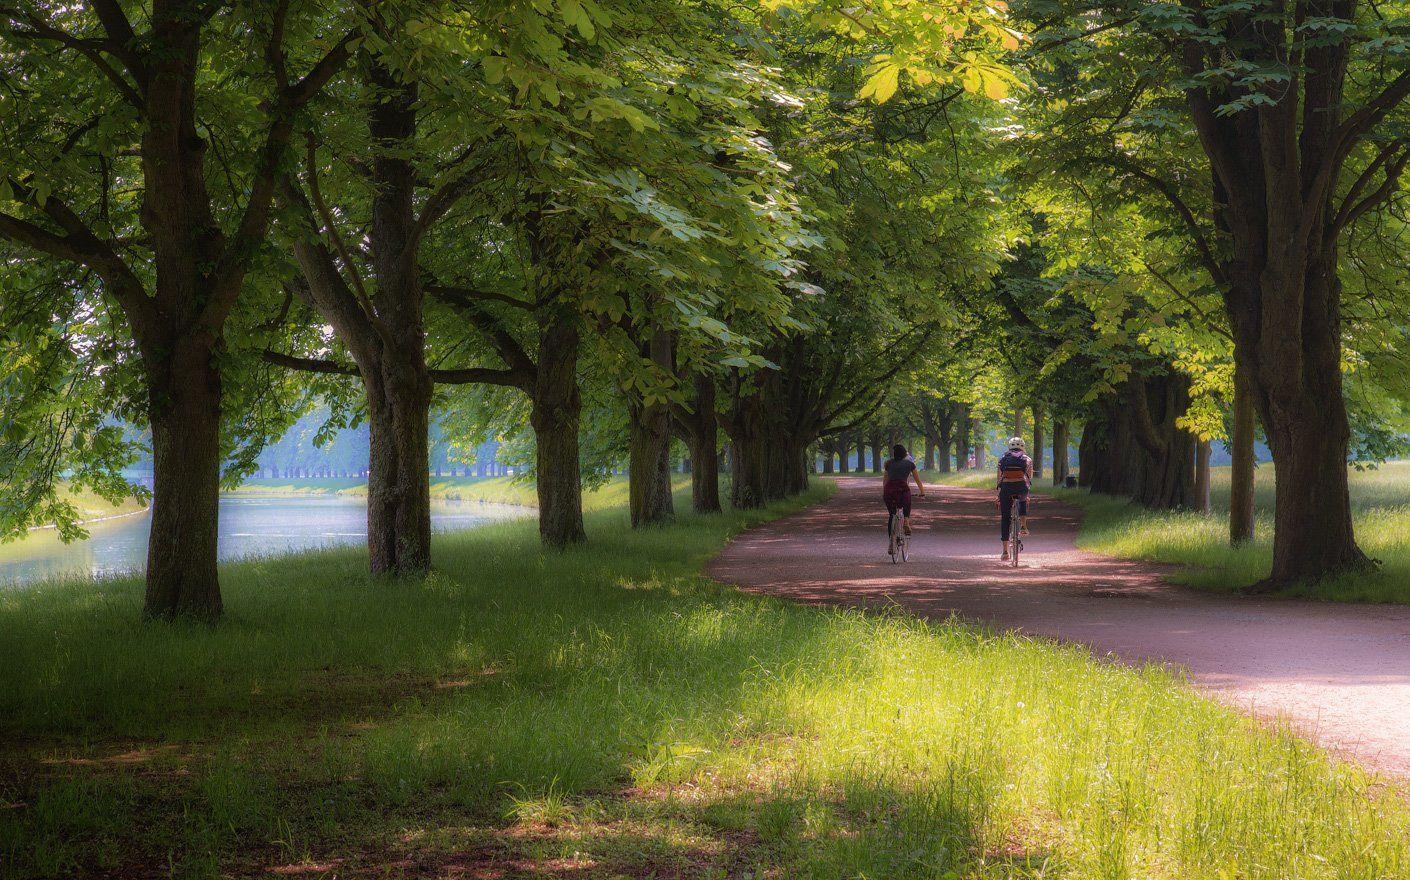 парк, дорожка, аллея, прогулка, пара, велосипед, Виктор Климкин